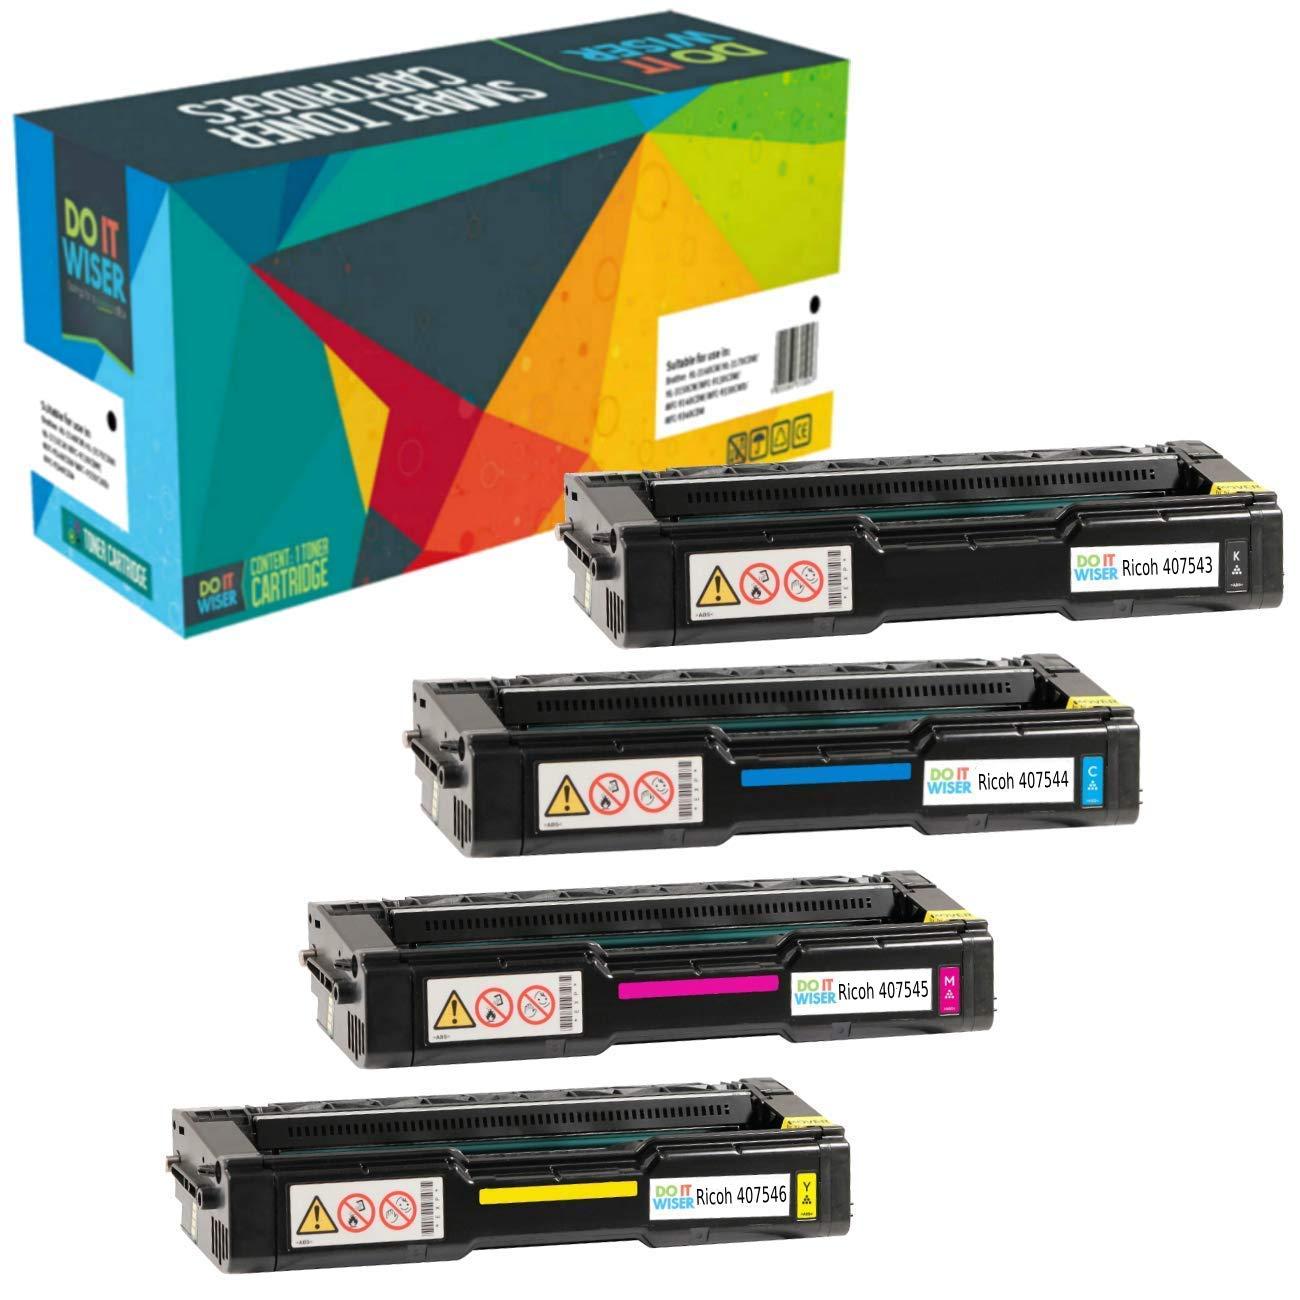 4 Doitwiser ® Kompatibel Toner für Ricoh SP C250 SP C250dn SP C250sf SP C252 SP C252dn SP C252sf - 407543 407544 407545 407546 Do it Wiser non Ricoh Original